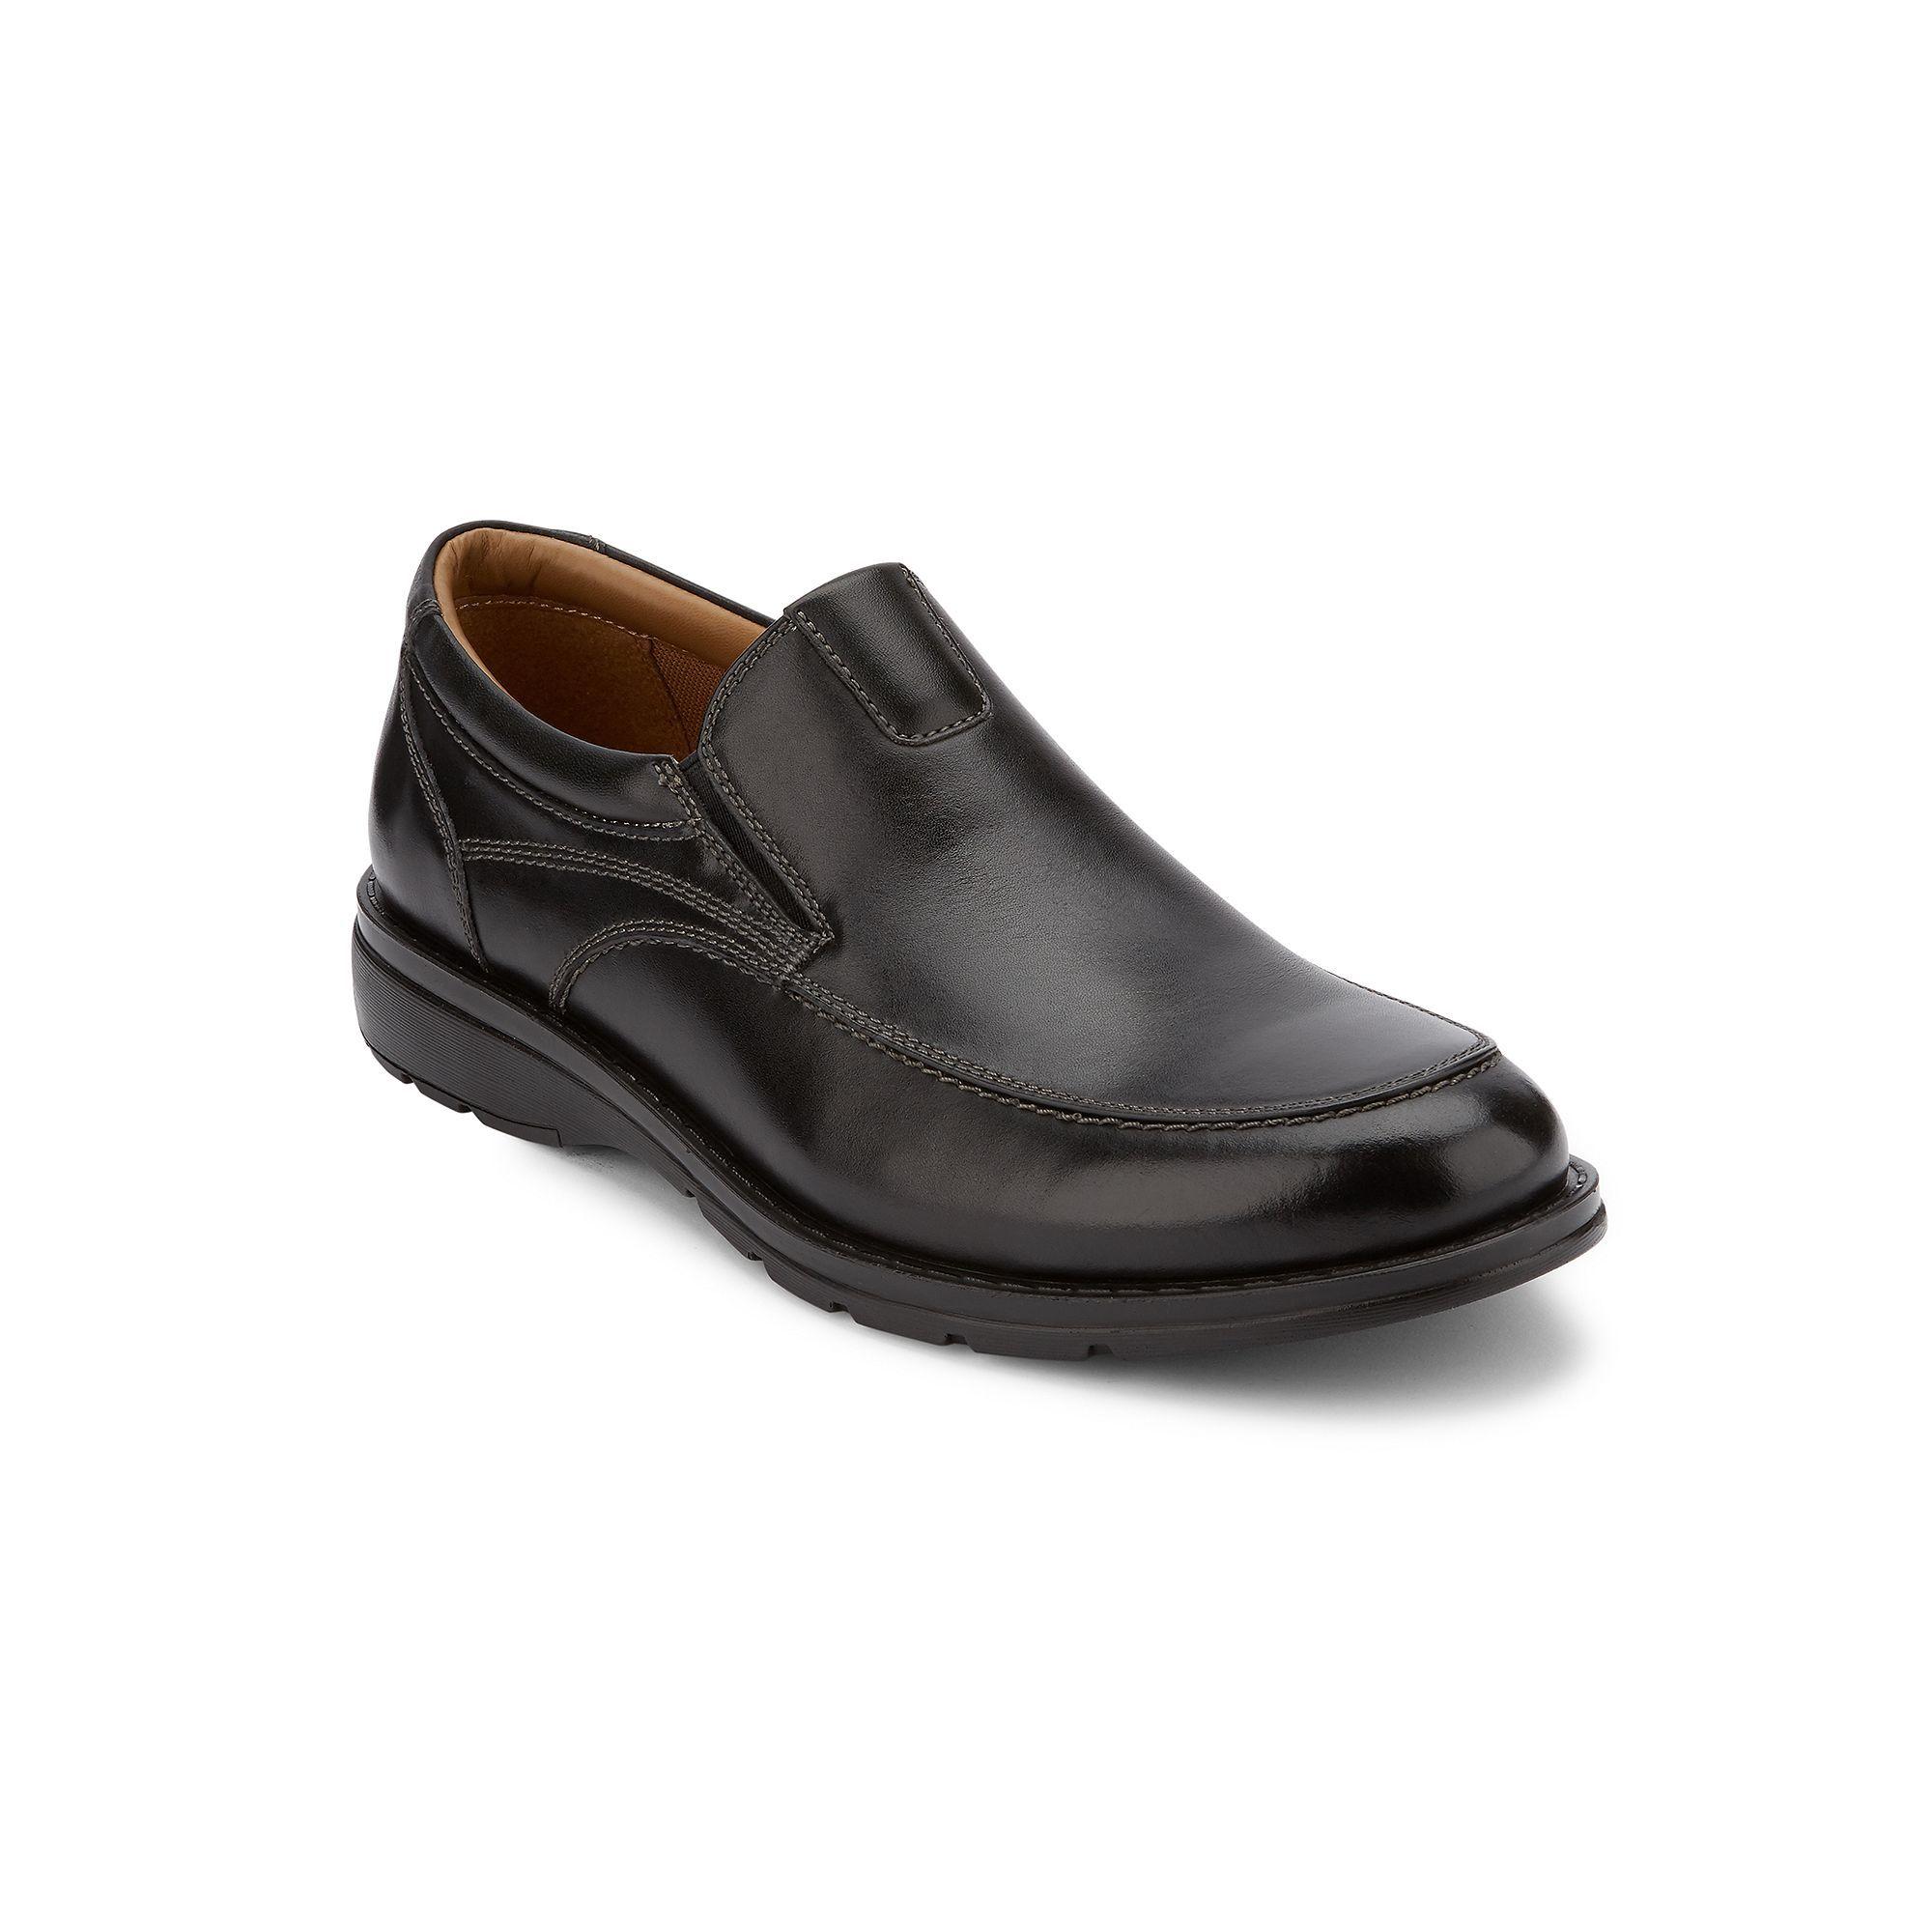 Dockers Calamar Men's Slip On Shoes, Black Mens slip on